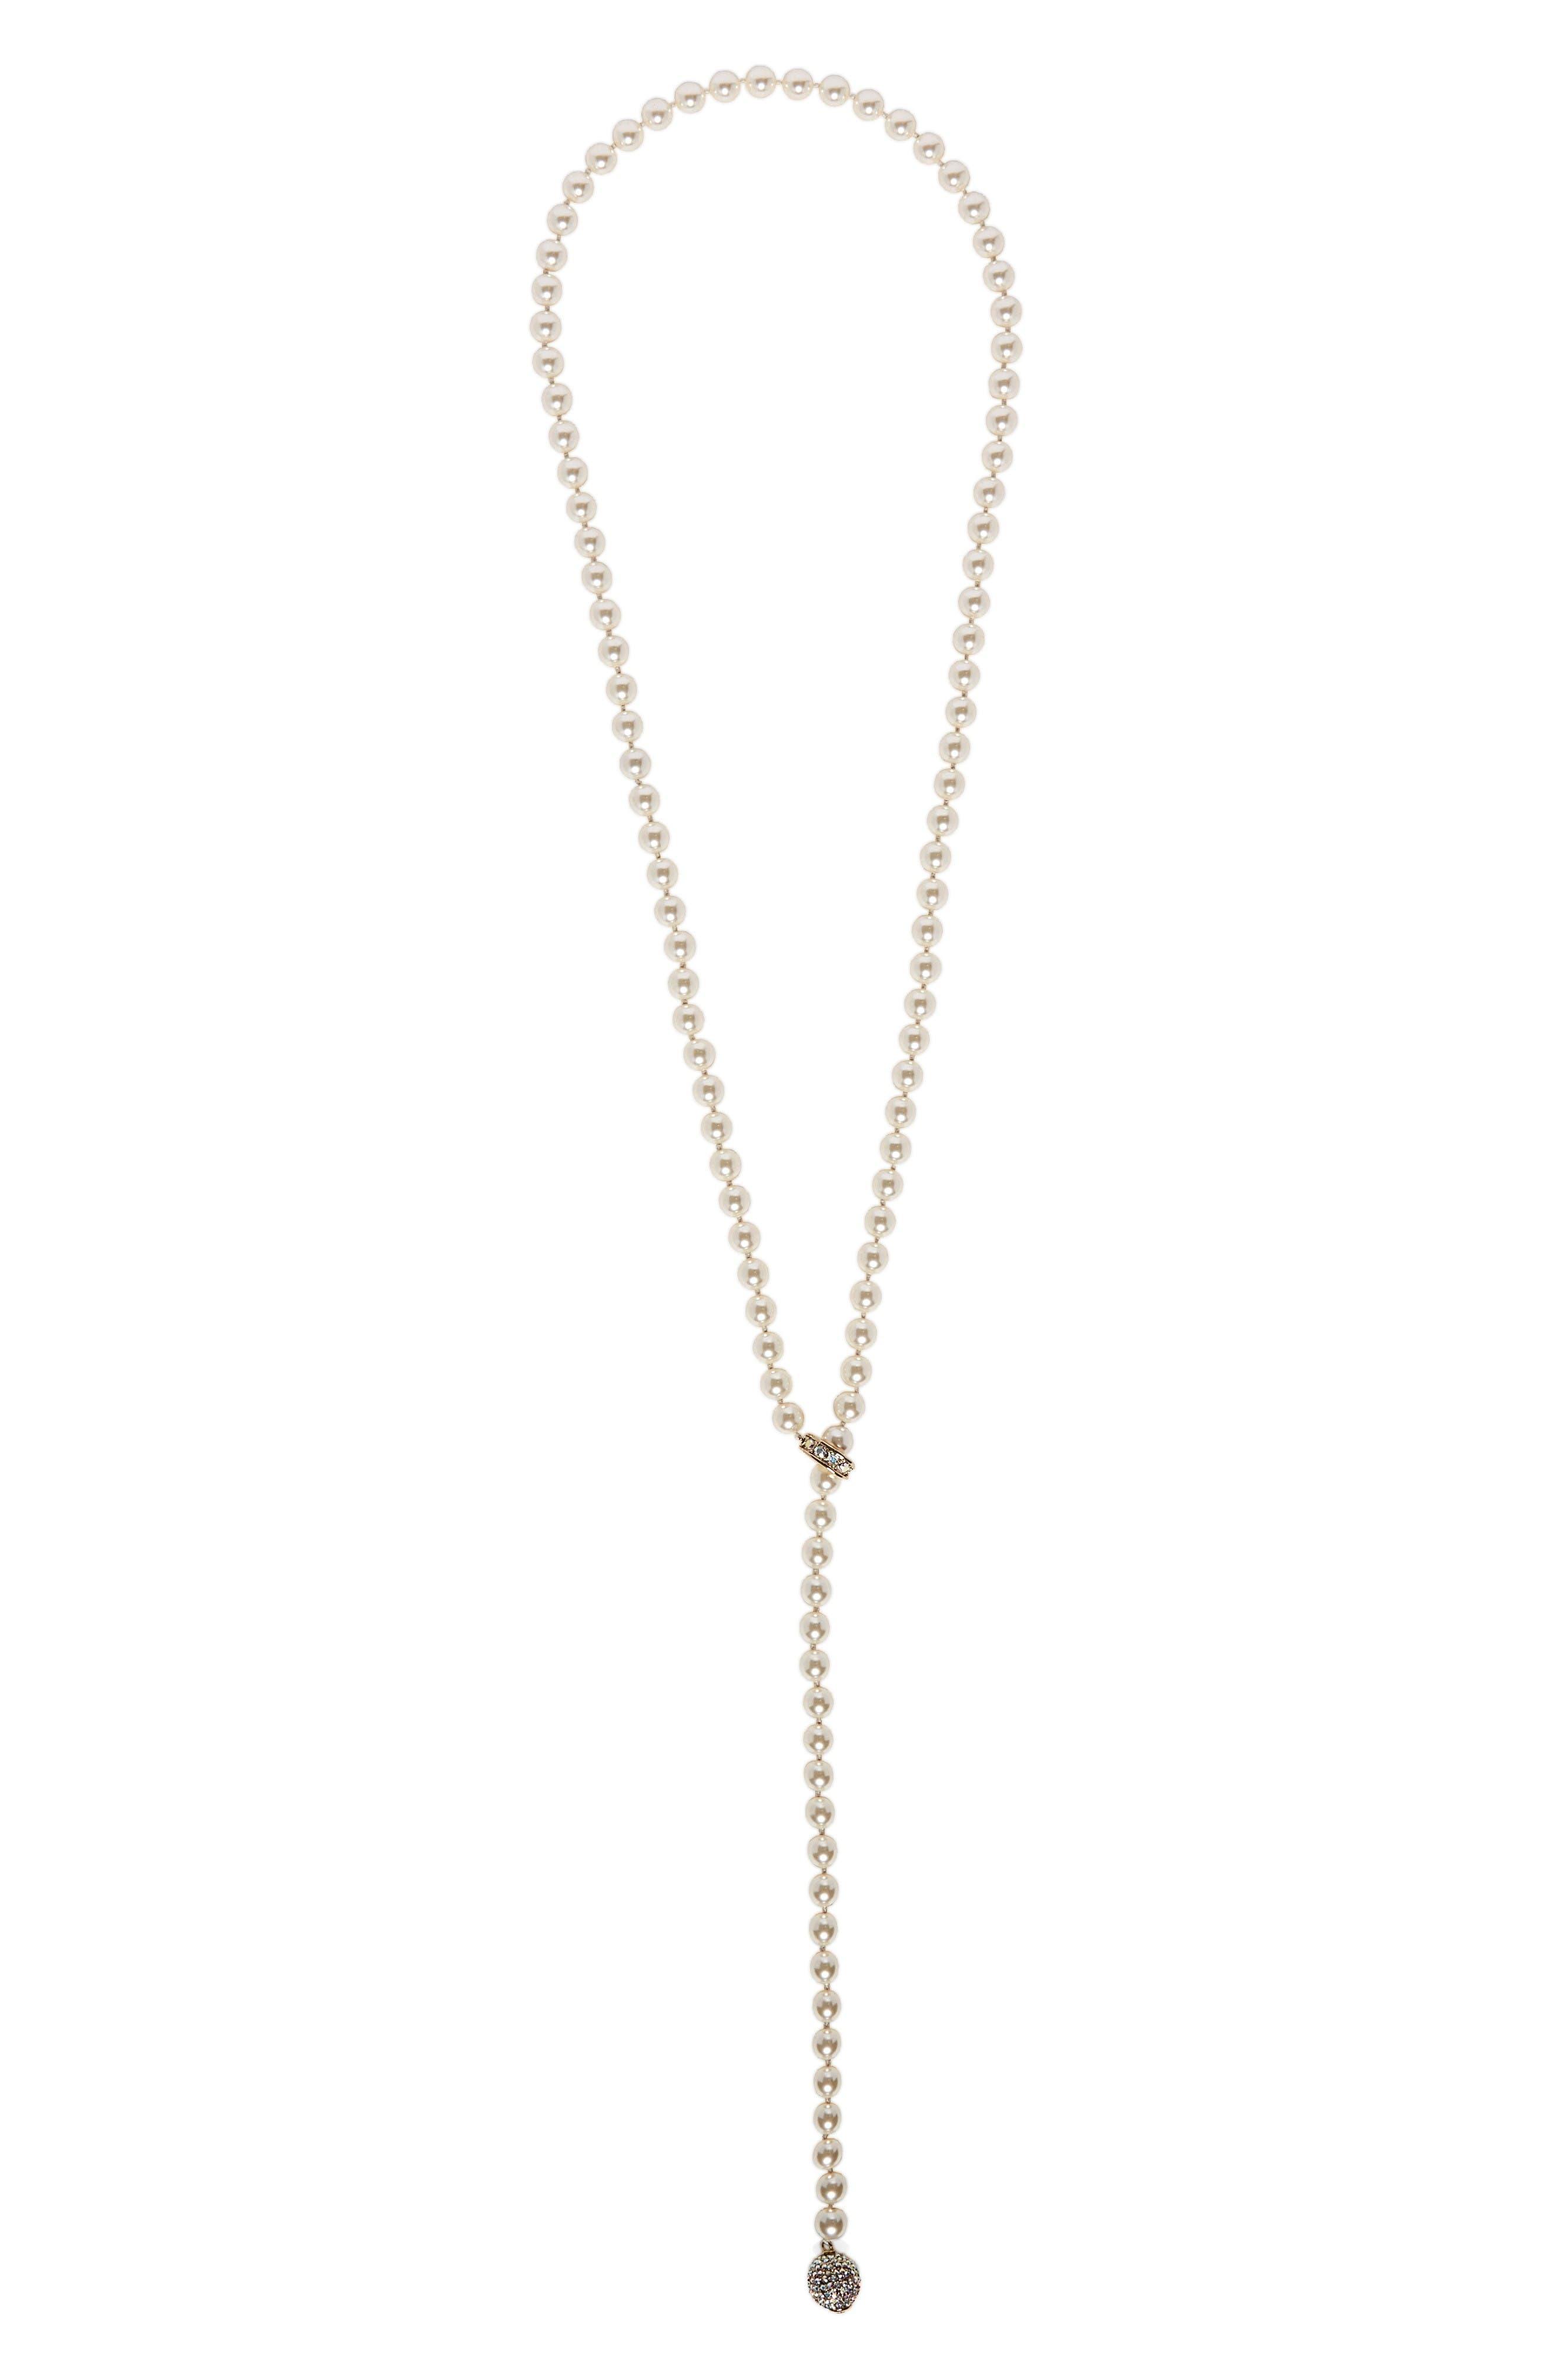 Main Image - St. John Collection Swarovski Imitation Pearl & Crystal Lariat Necklace